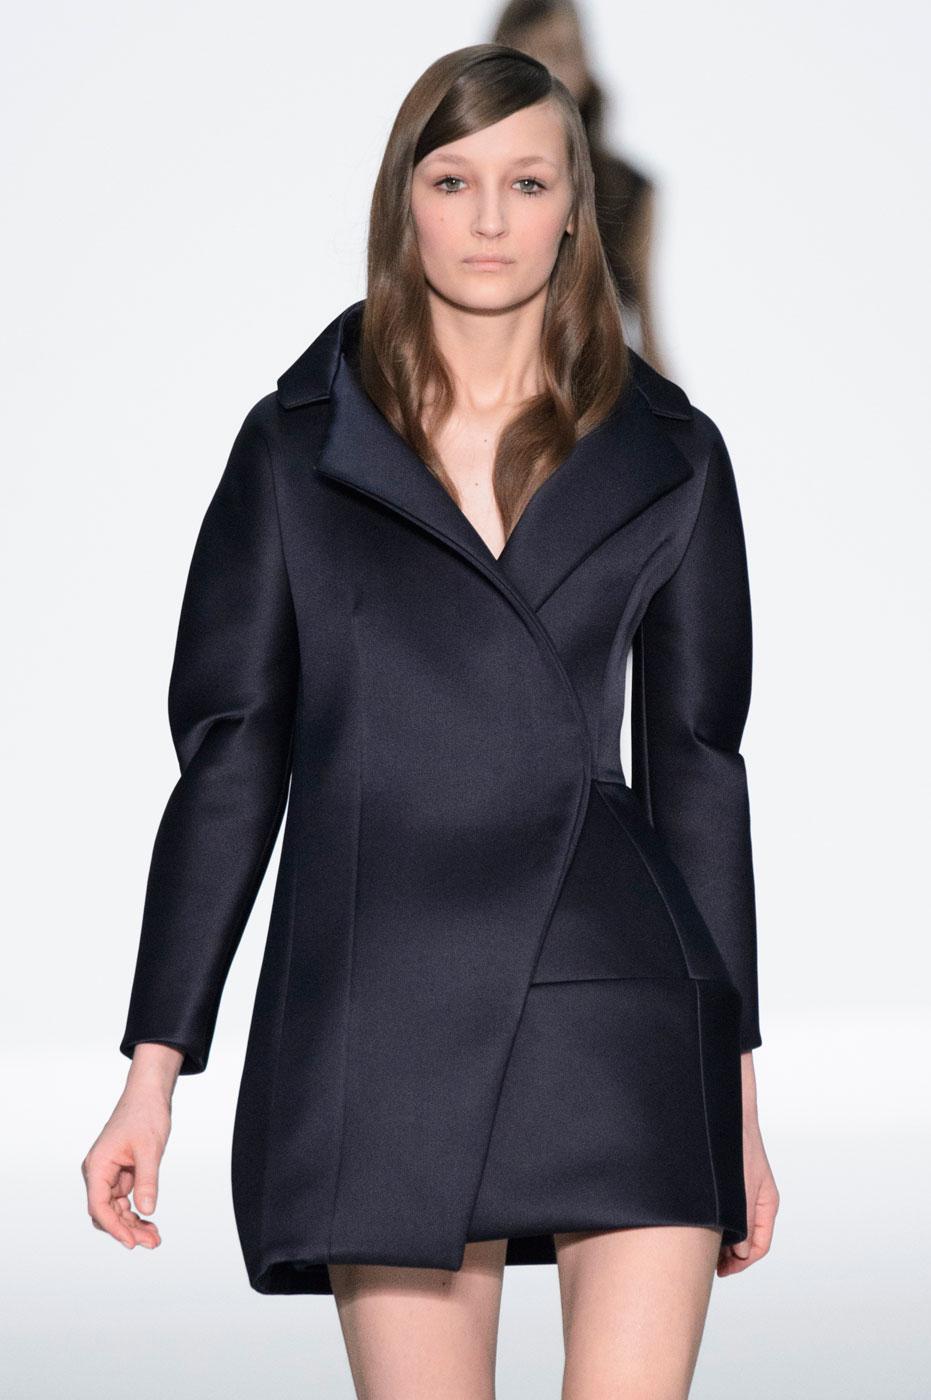 Kayek-fashion-runway-show-haute-couture-paris-spring-summer-2015-the-impression-02